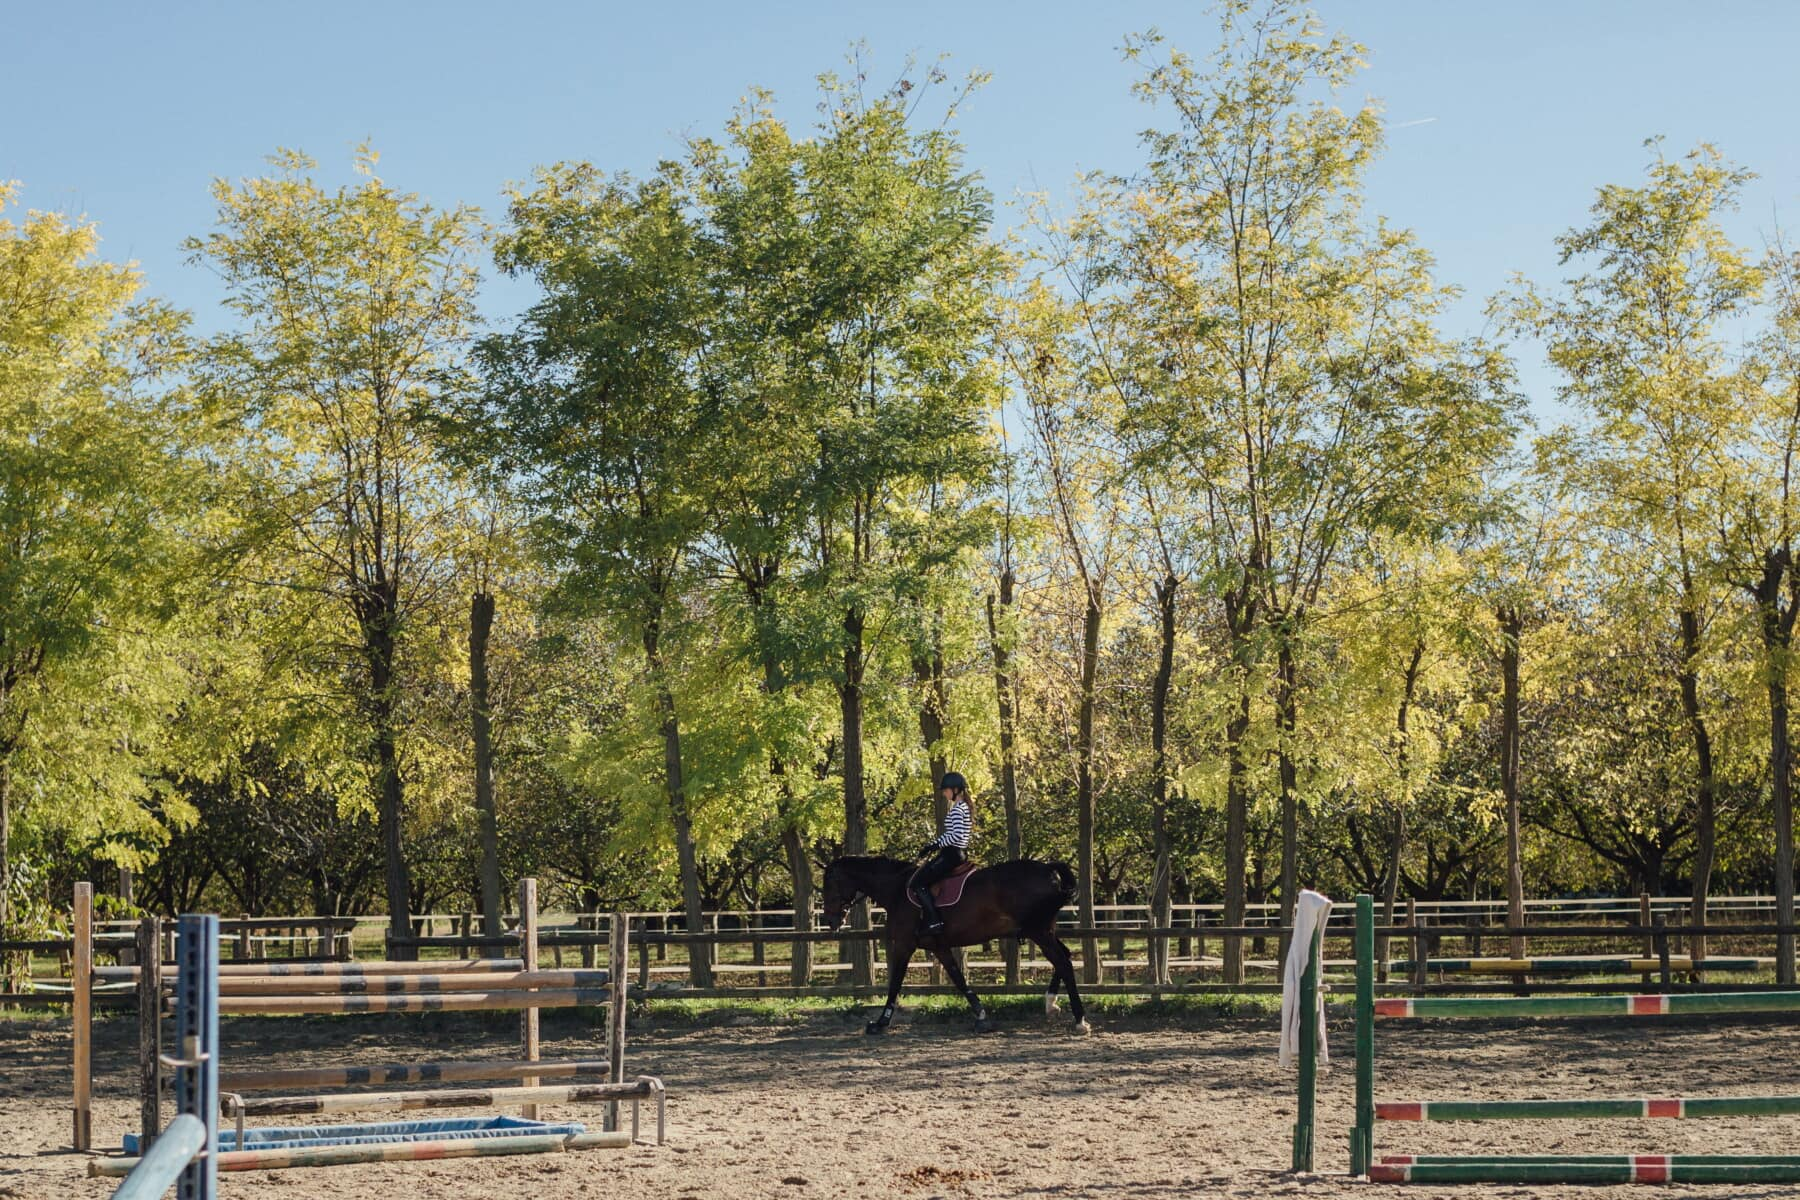 horse, rider, riding, training, training program, sport, forest, tree, nature, rural